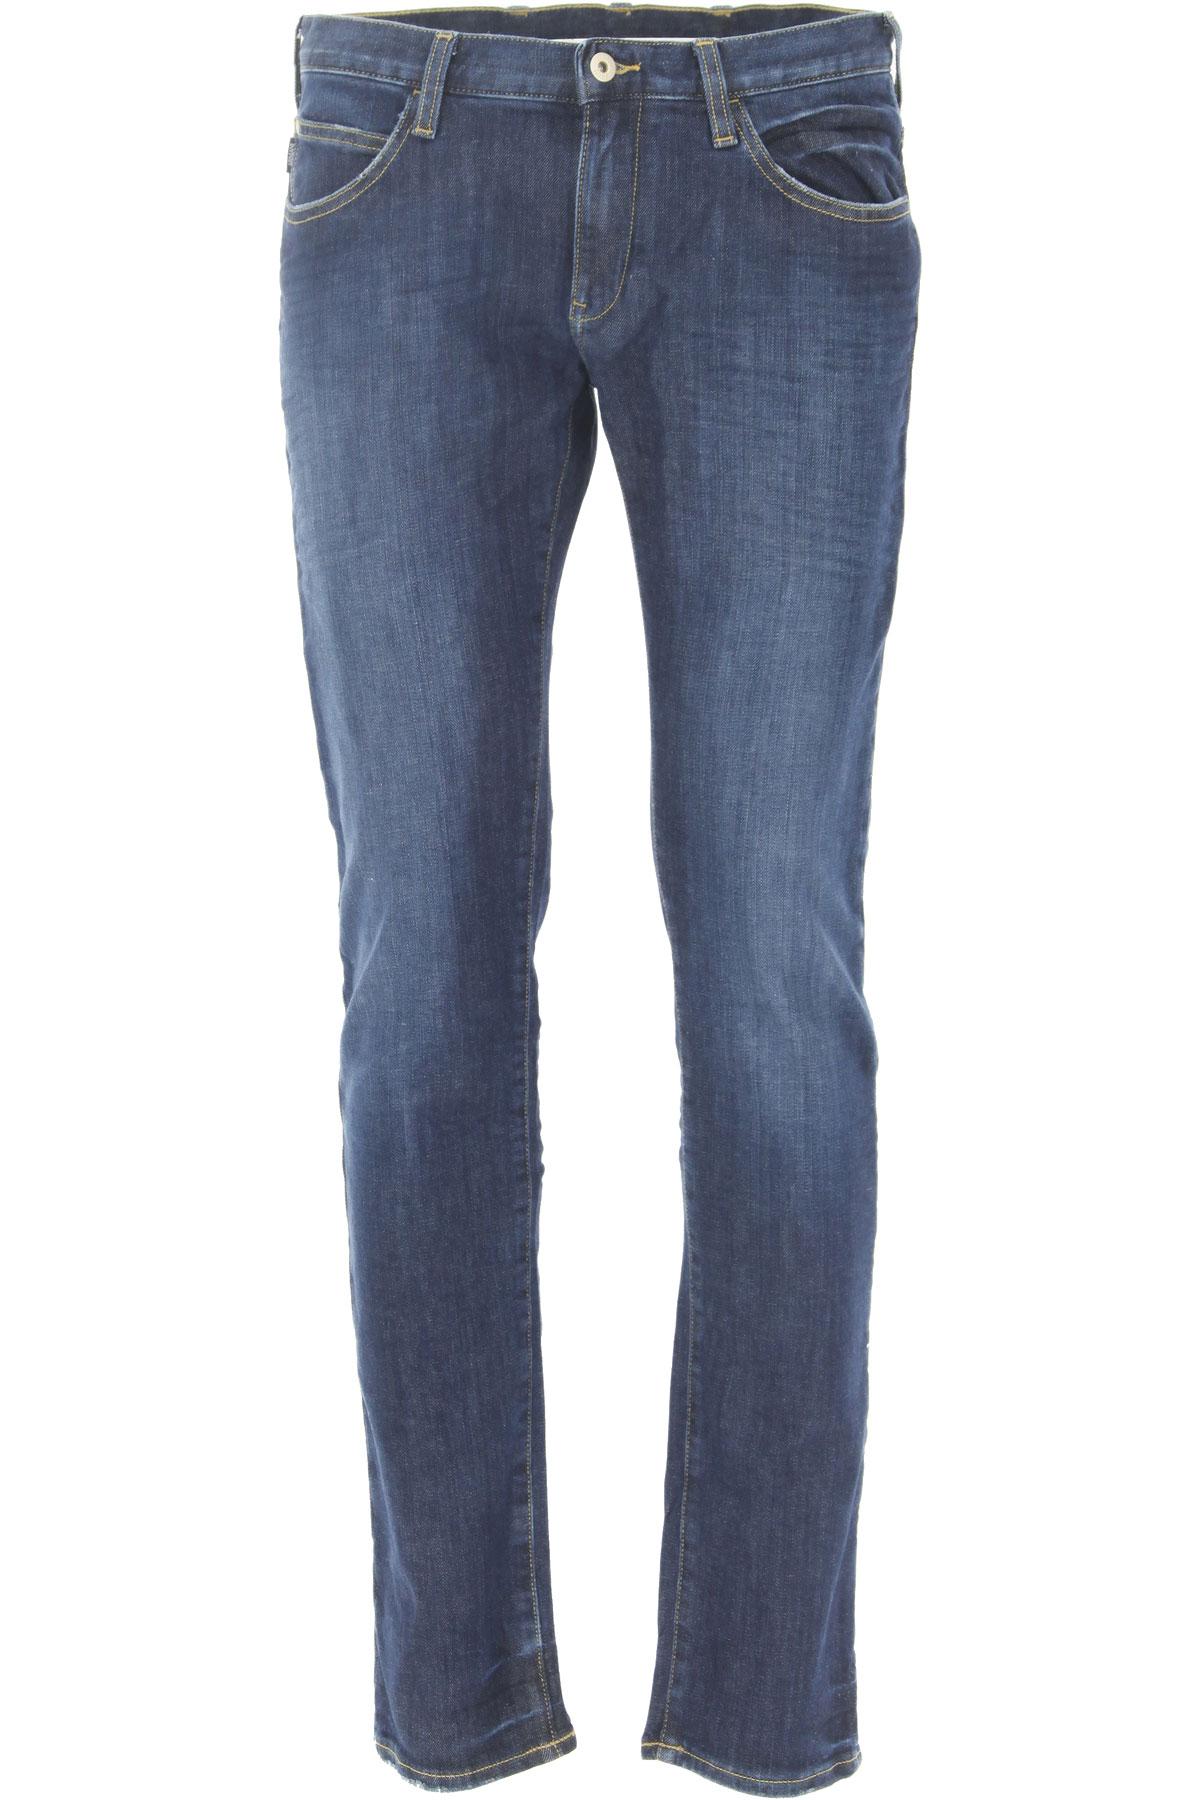 bb779e73586c Emporio Armani. Clothing for Men